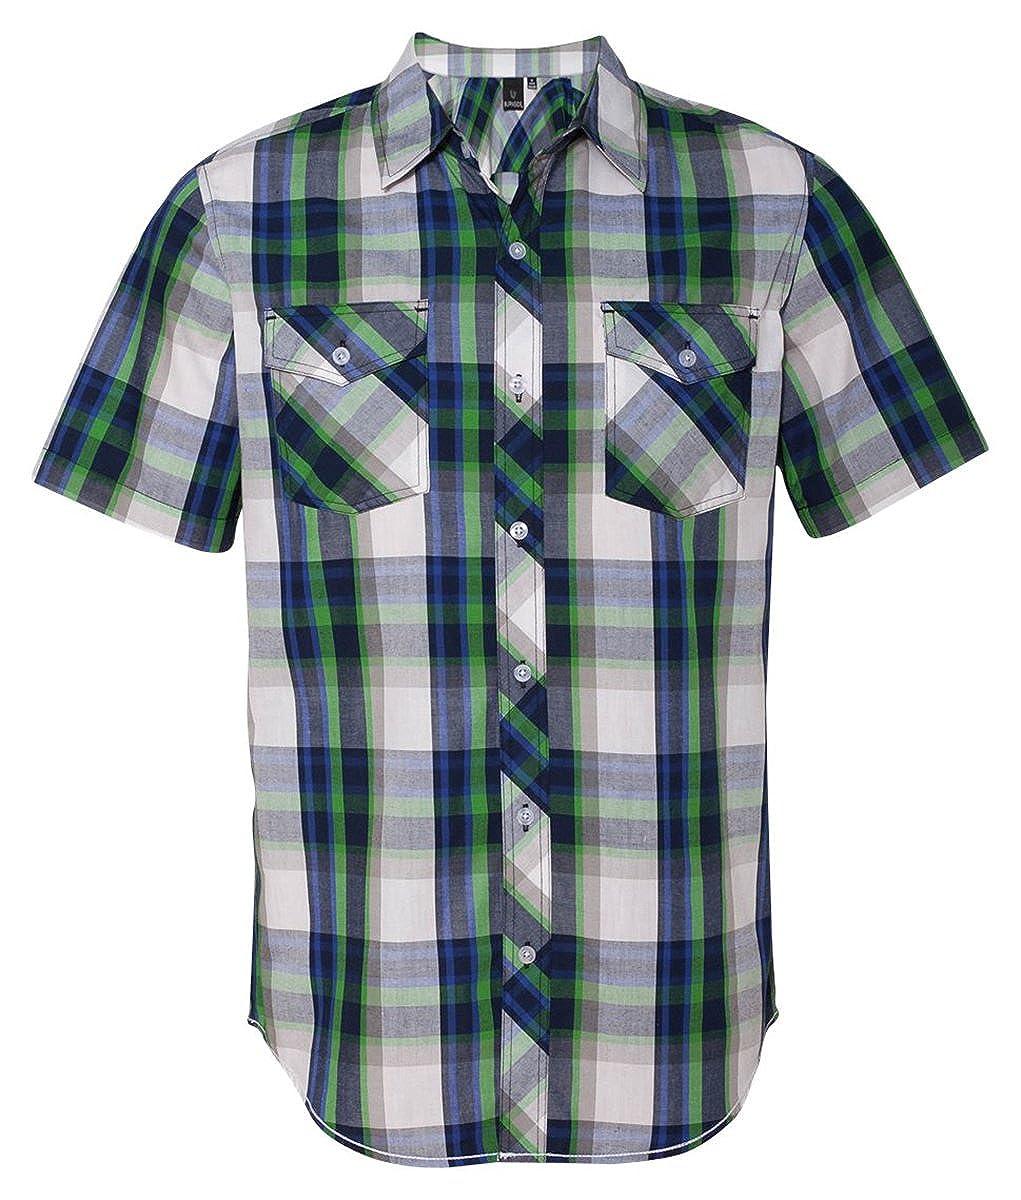 Amazon.com: Burnside Mens Plaid Short Sleeve Shirt-B9202: Clothing